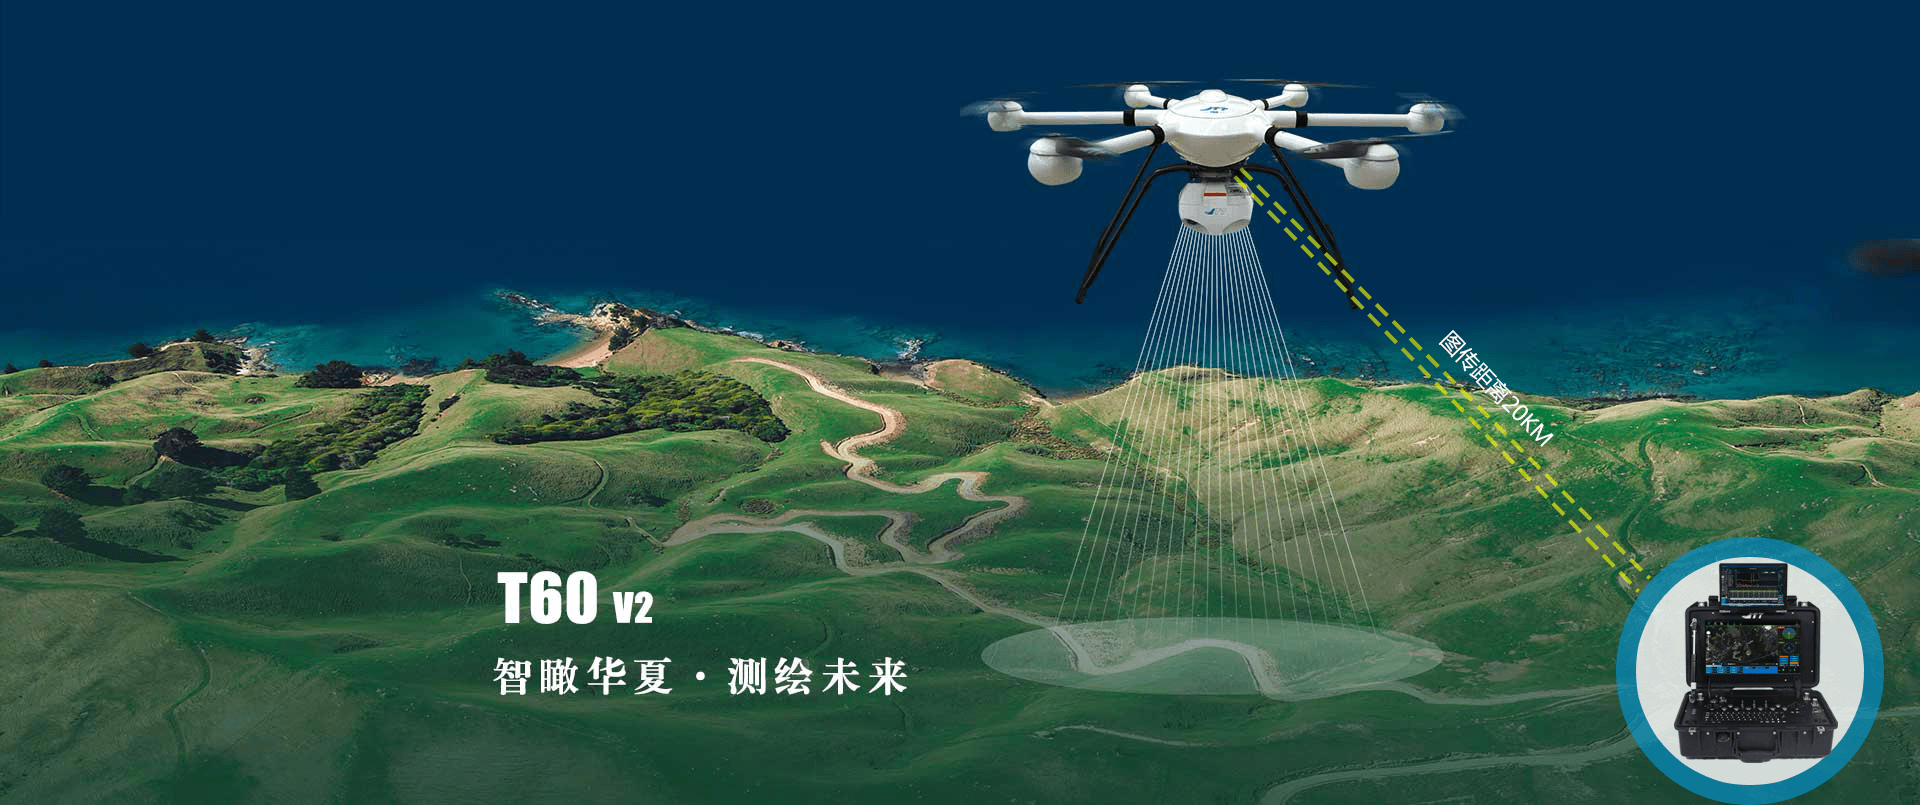 T60 V2工业无人机